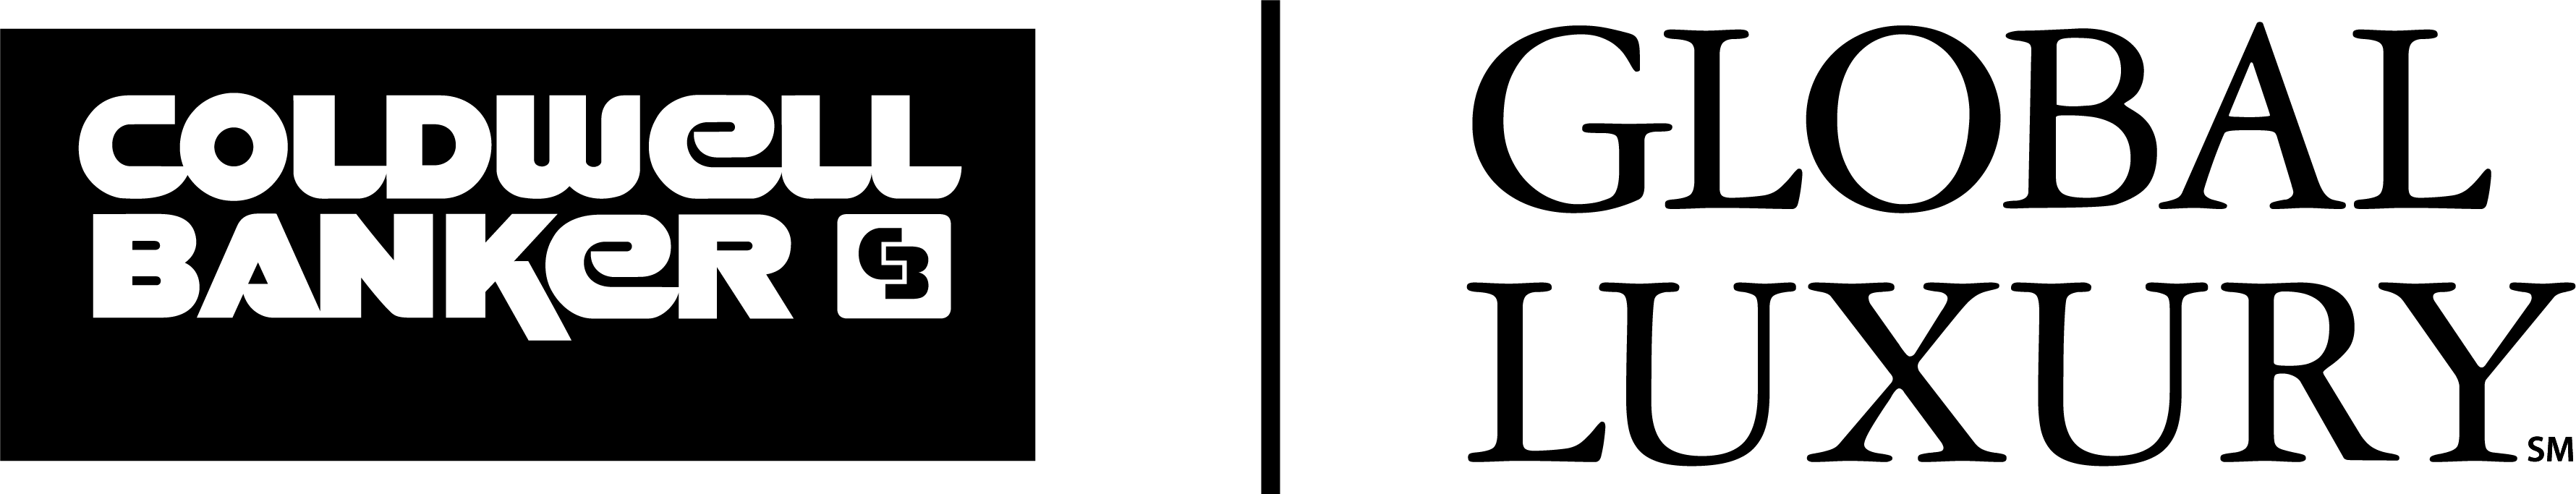 Coldwell Banker Global Luxury logo